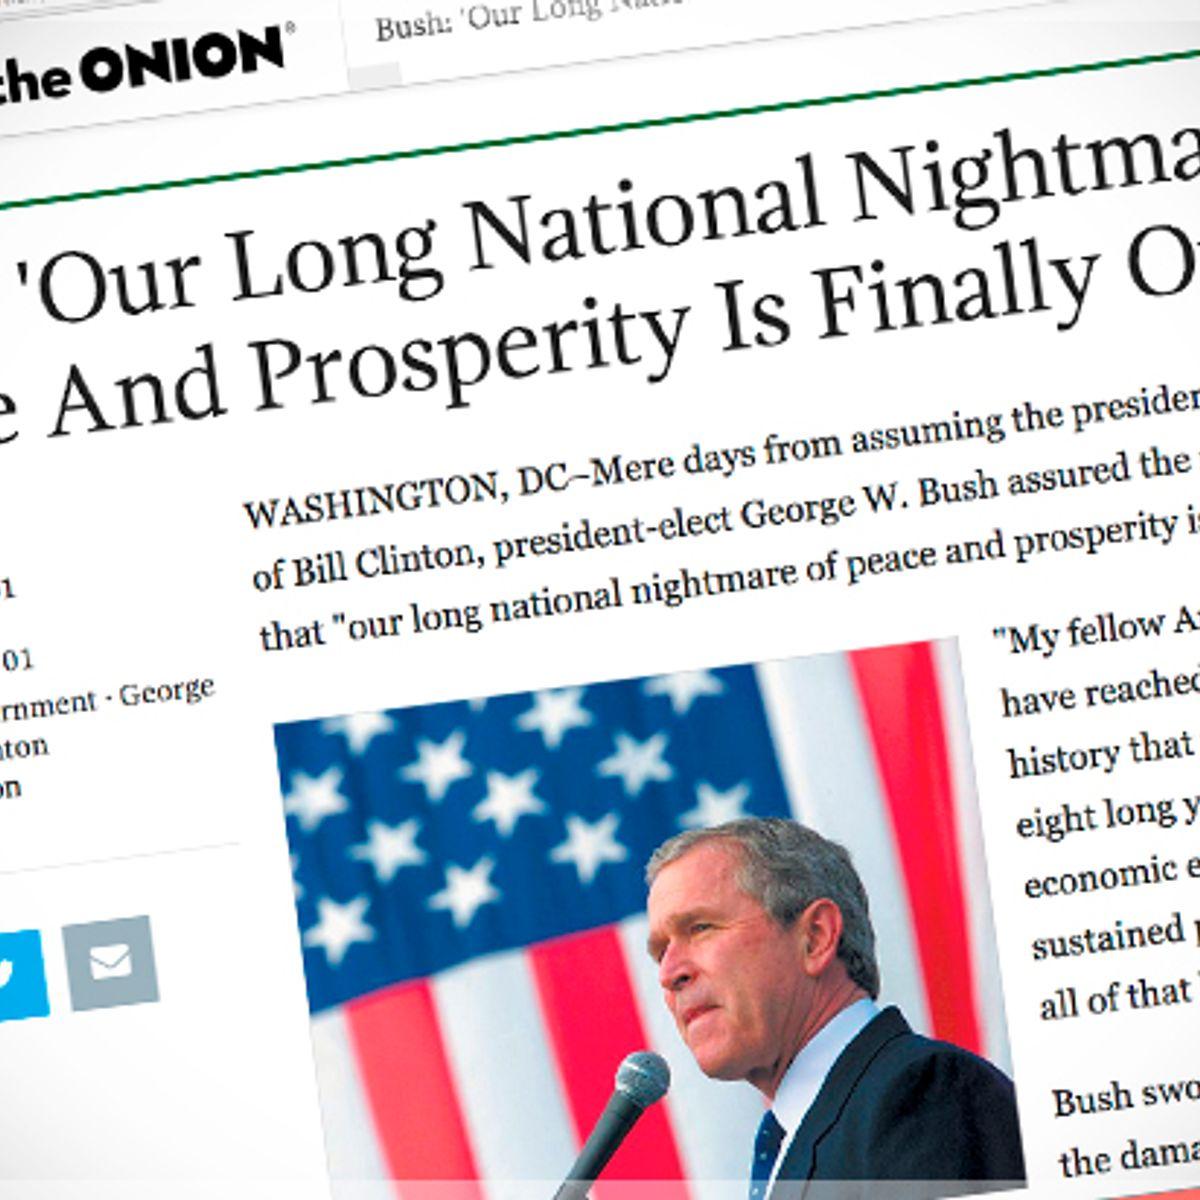 16 Times The Onion Masterfully Trolled American Politics Salon Com